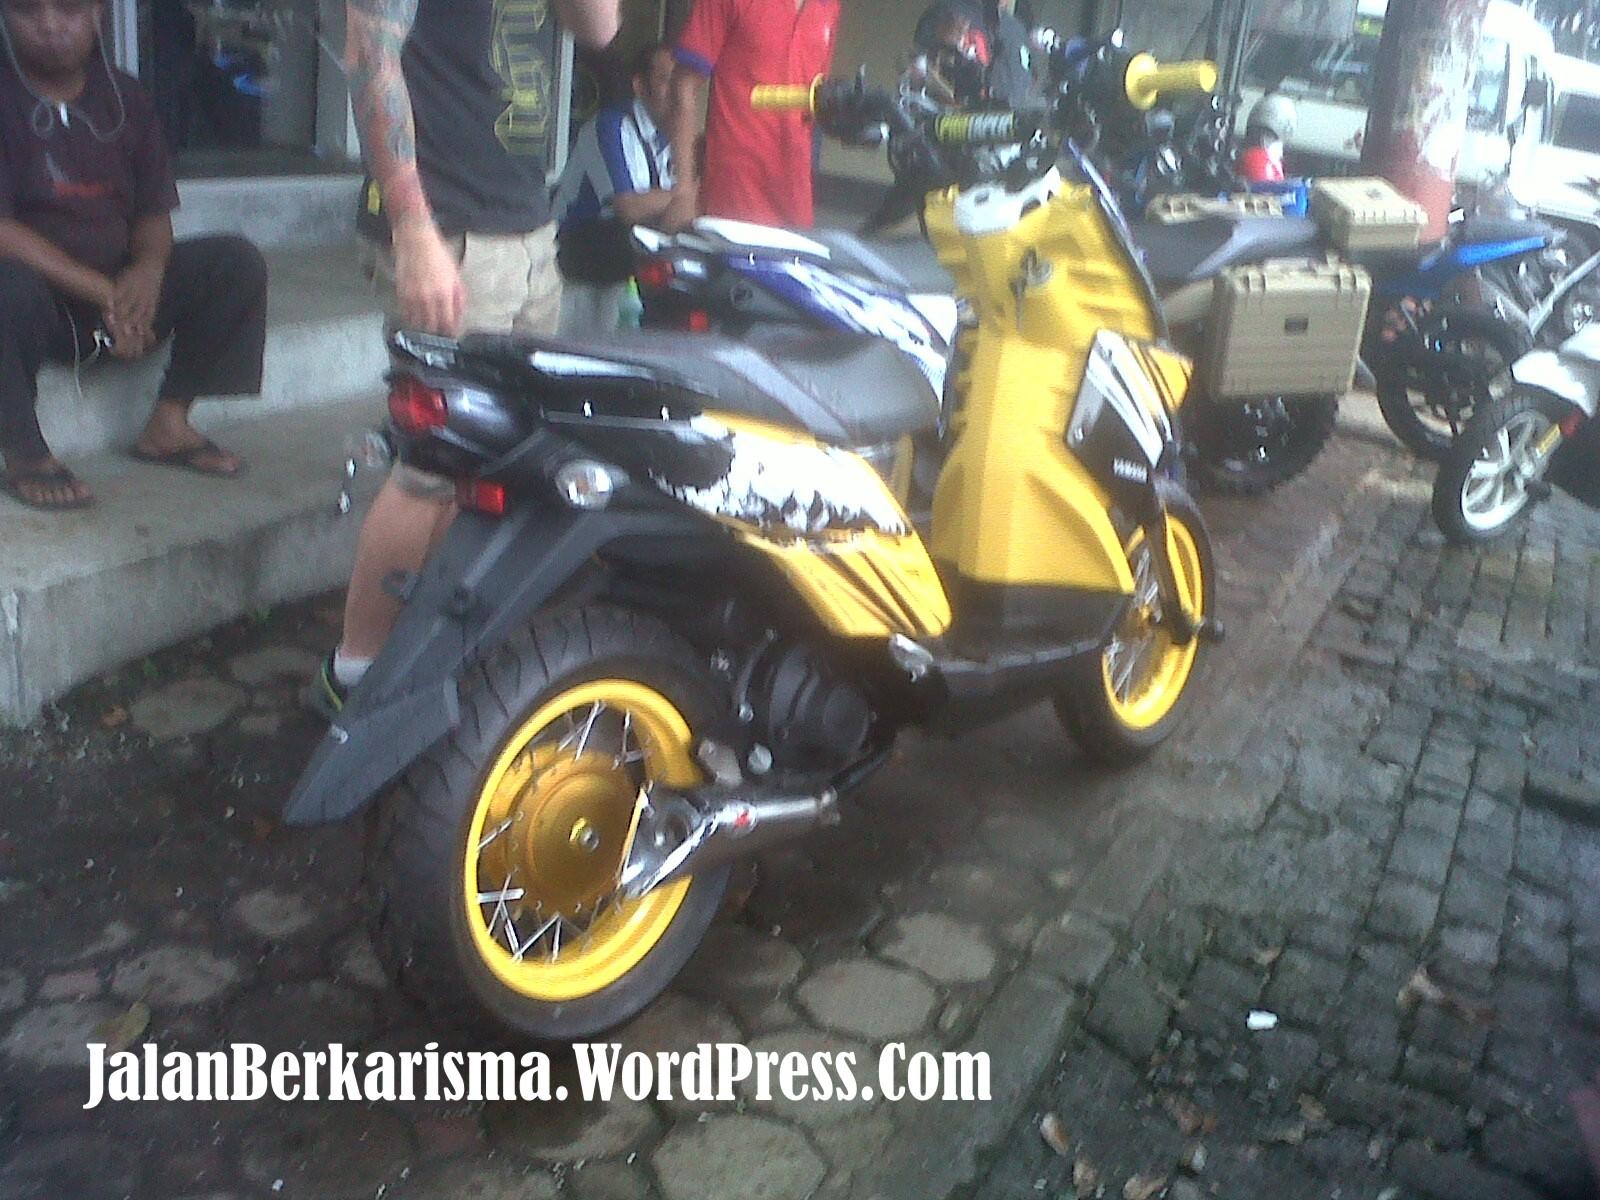 Bertemu X Ride Modif Untuk Acara Launching Nanti MenyusuriJalanCom